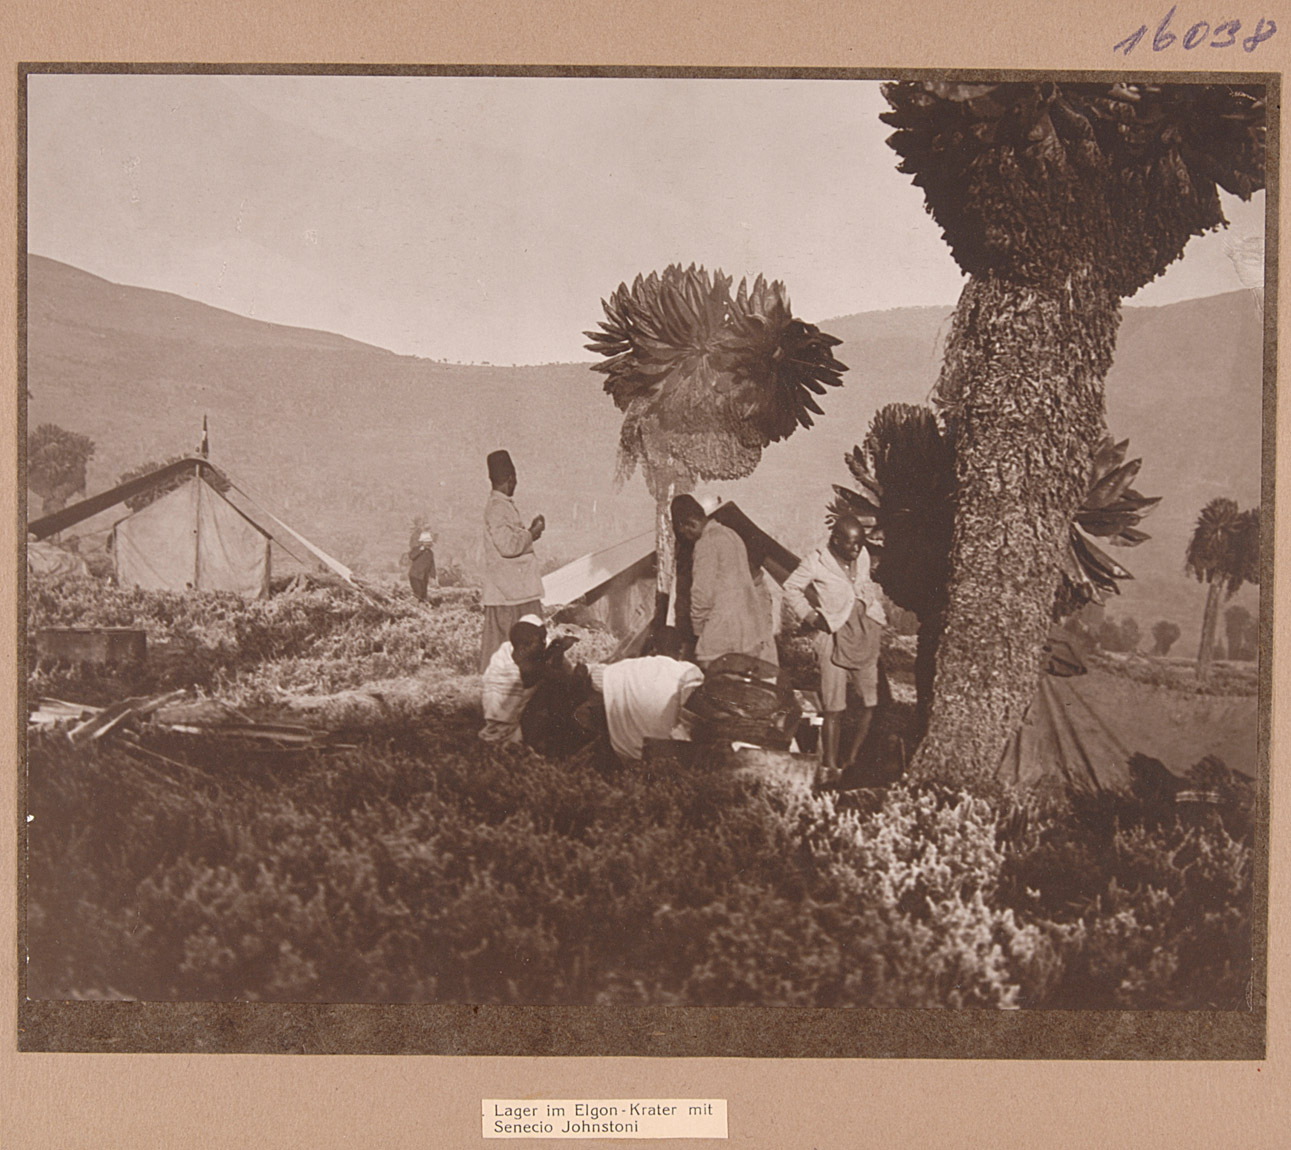 Lager im Elgon-Krater mit Senecio Johnstoni von Rudolf Kmunke